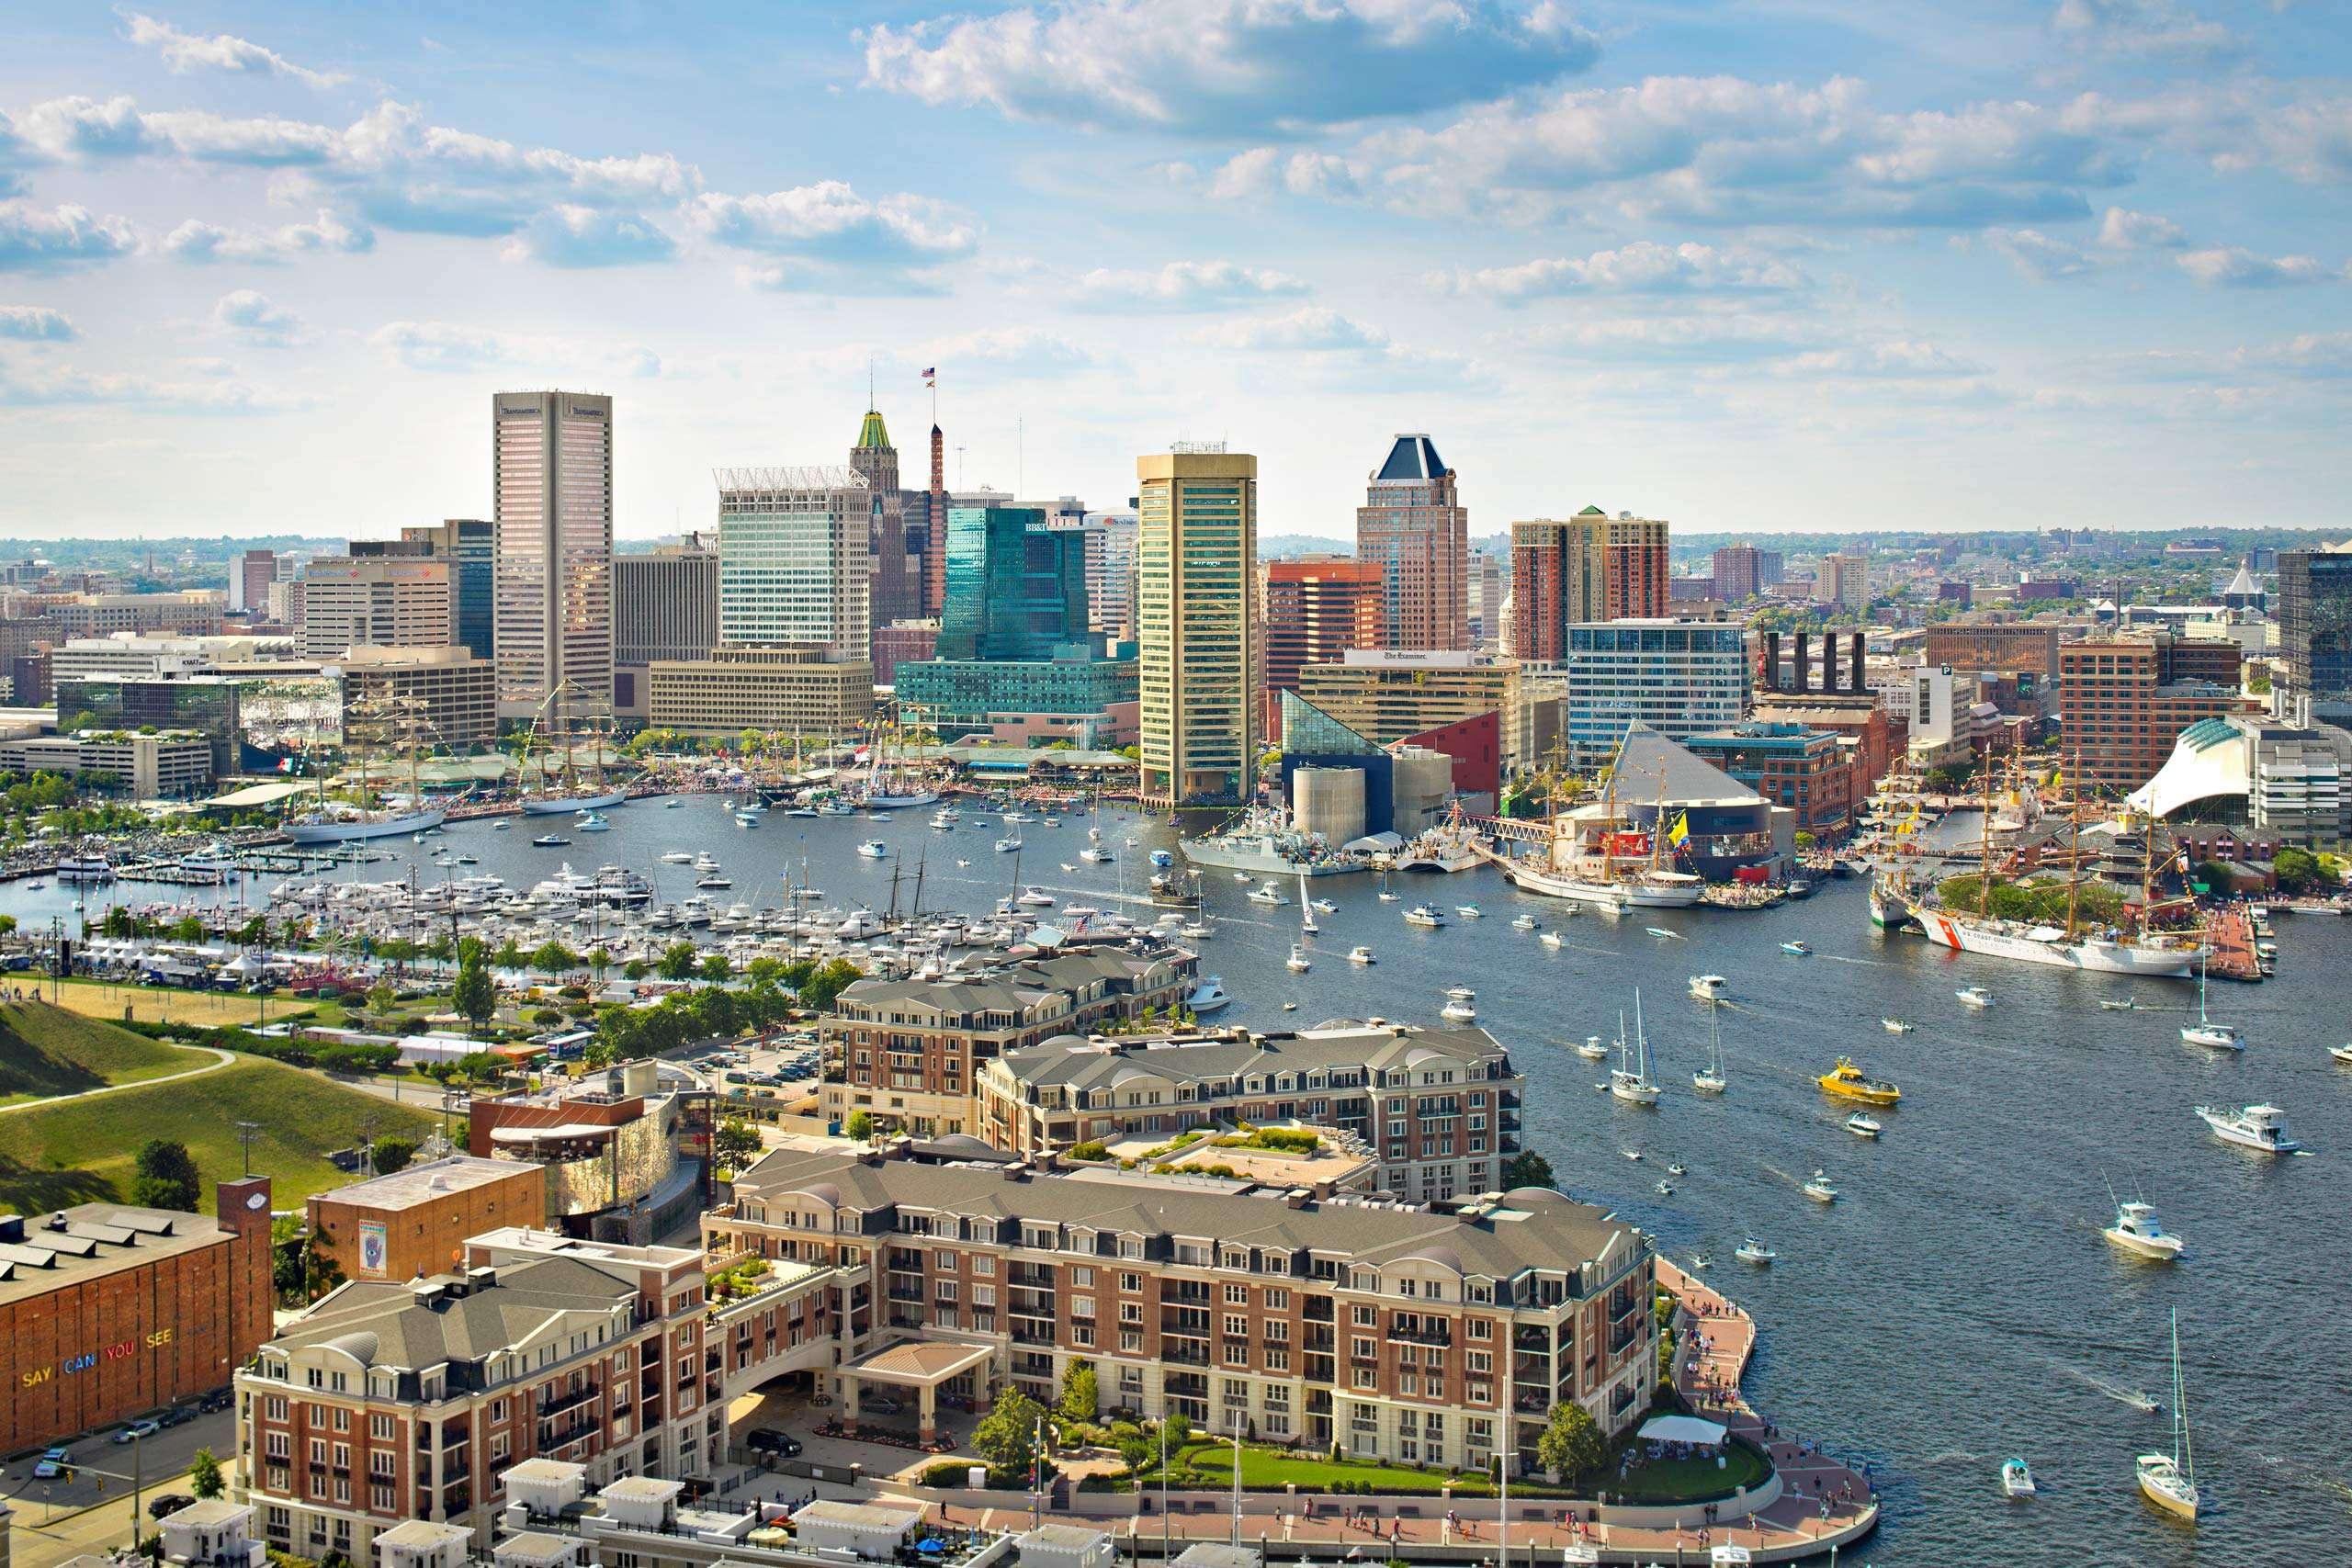 PORTFOLIO - Baltimore - Attractions  #19 - PCG670